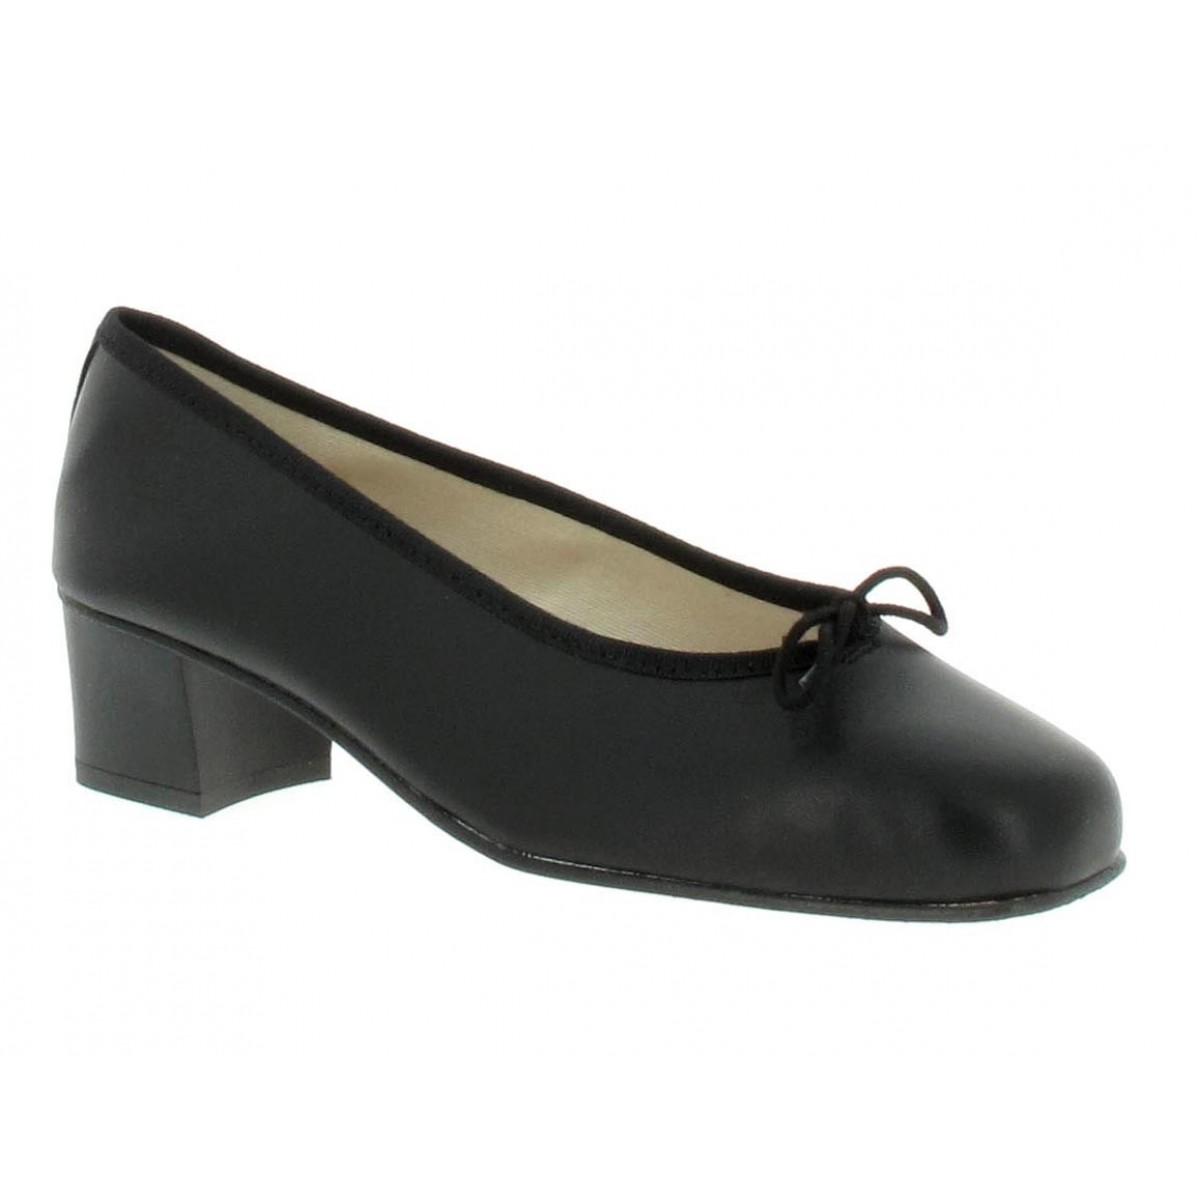 Ballerines HIRICA Sonia cuir Femme Noir